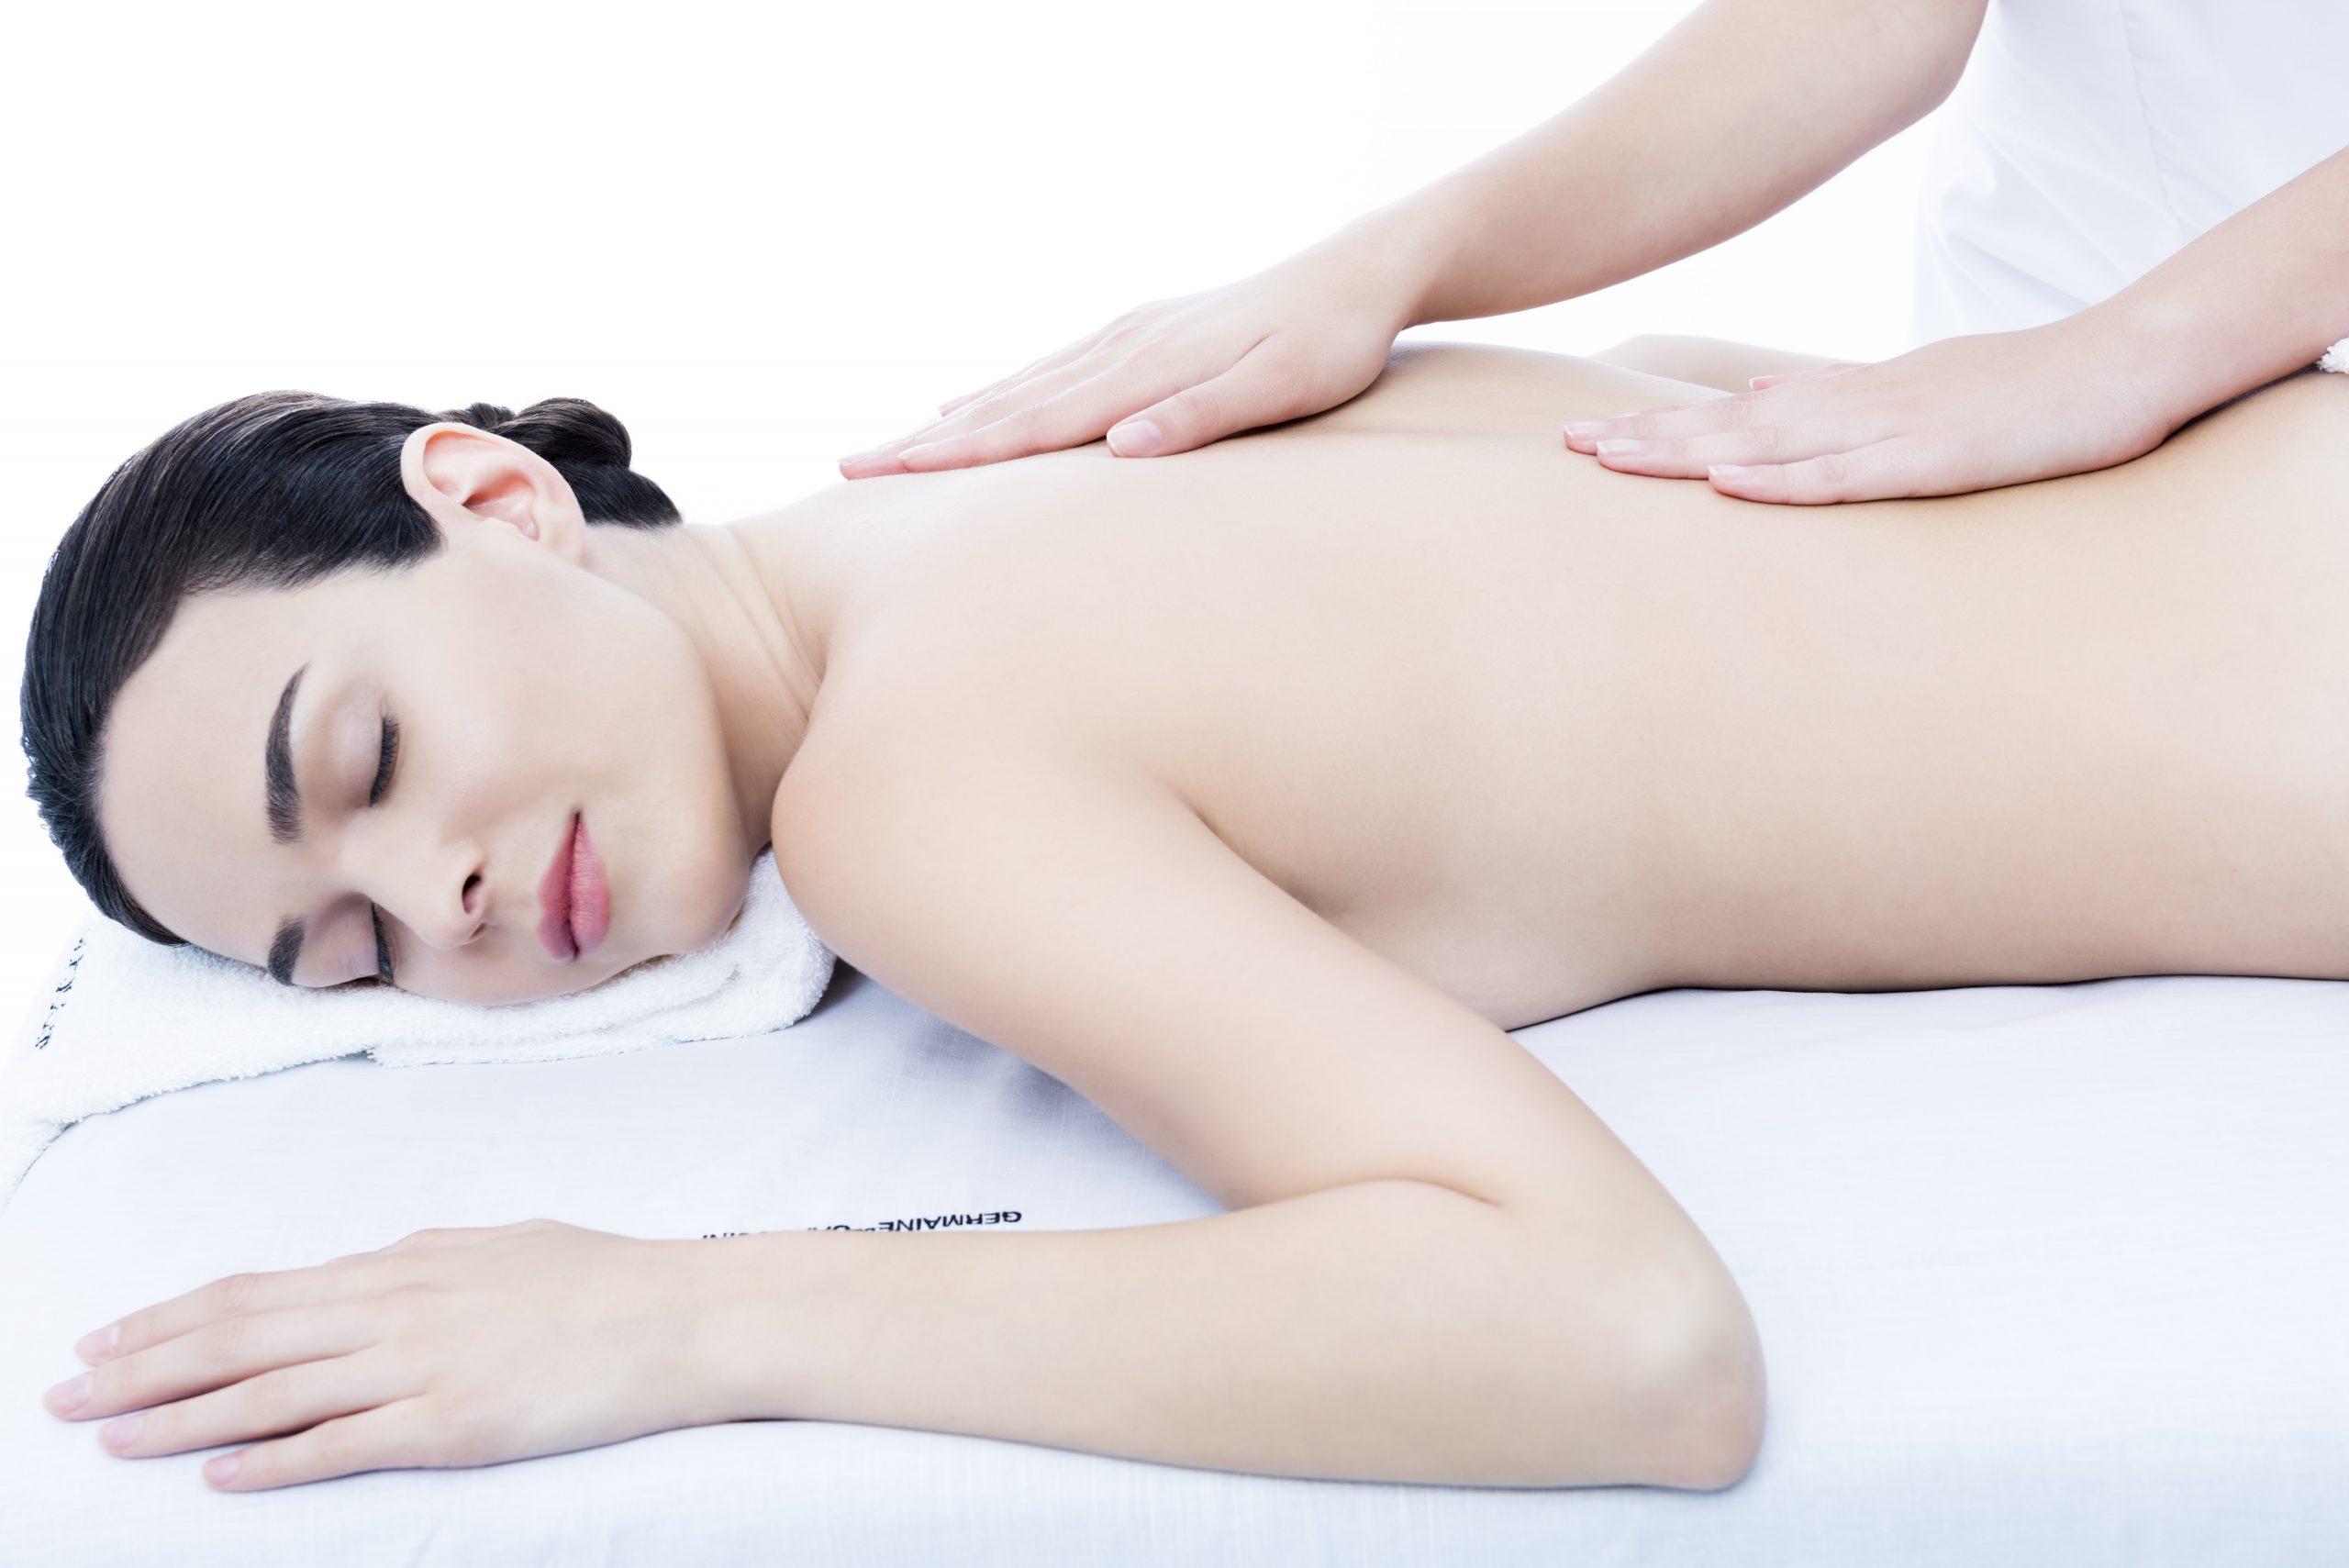 Back massage, Germaine de capuccini, beauty salon, massage, relaxation, chertsey, surrey